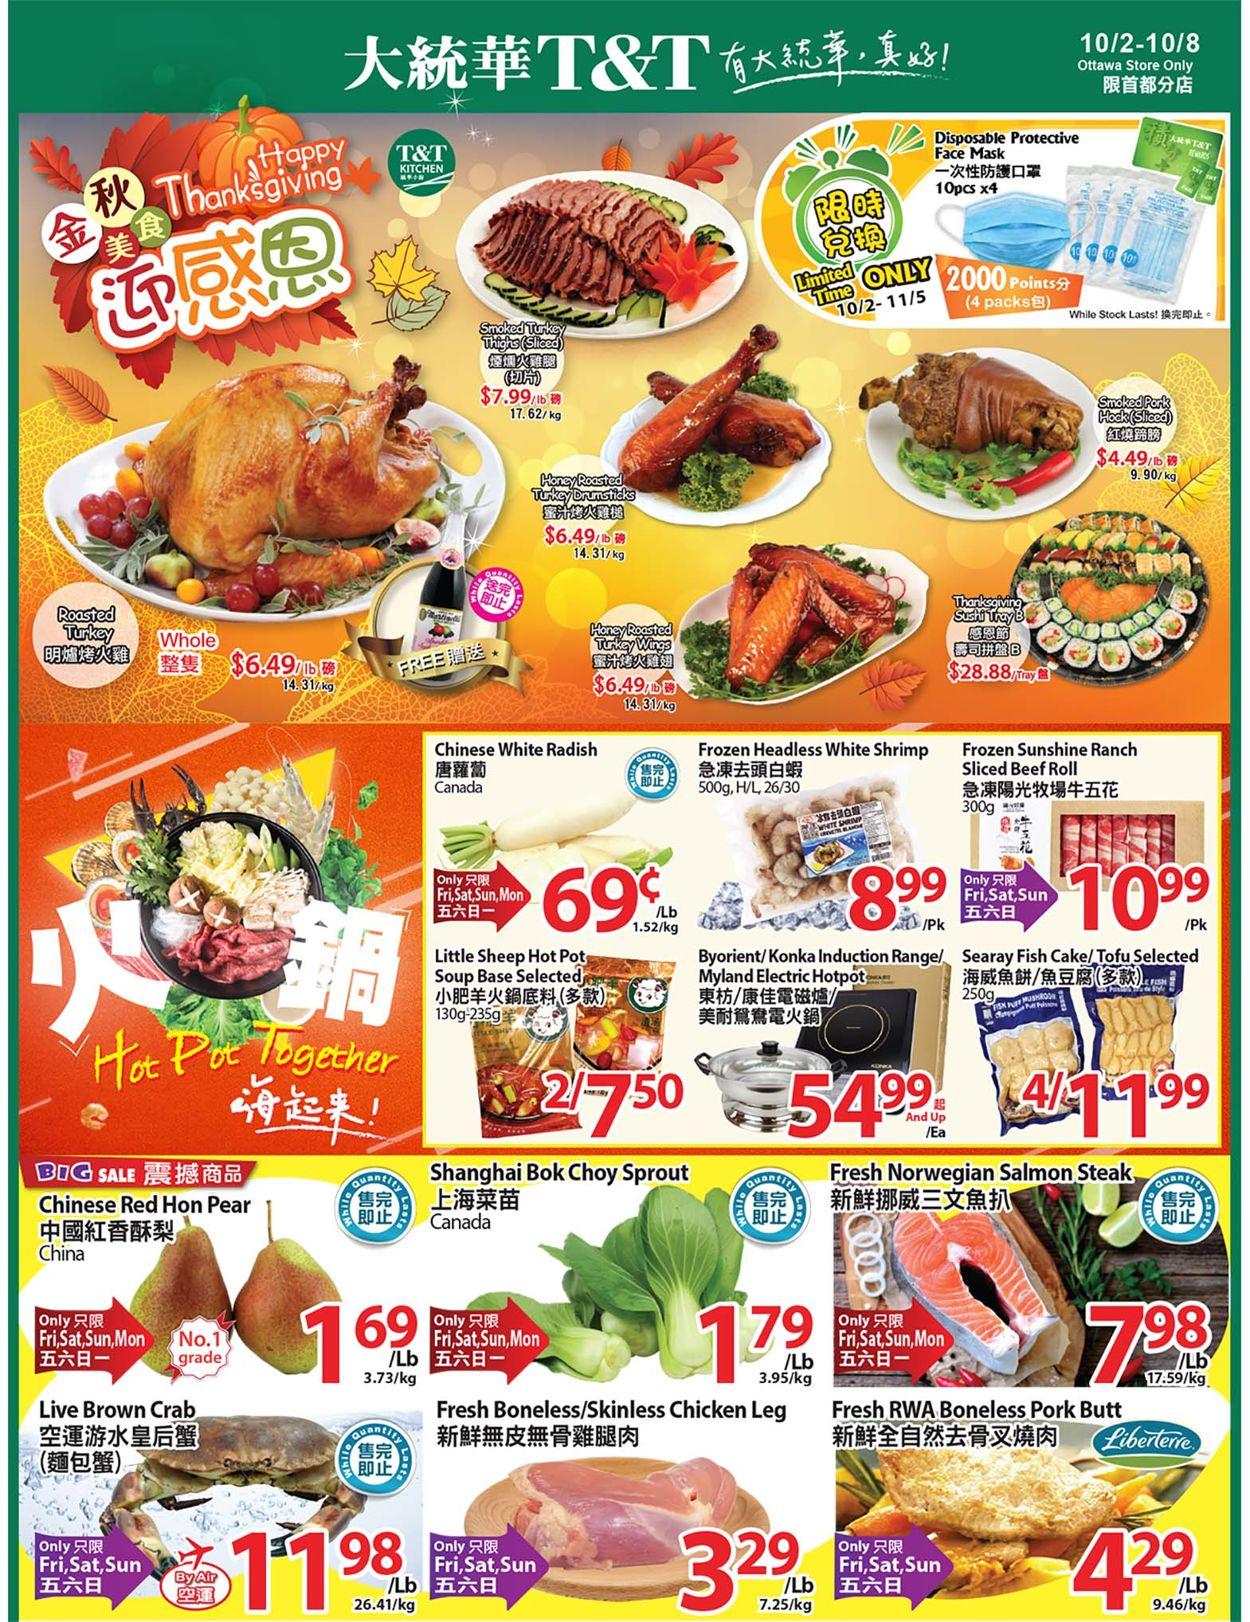 T&T Supermarket - Ottawa Flyer - 10/02-10/08/2020